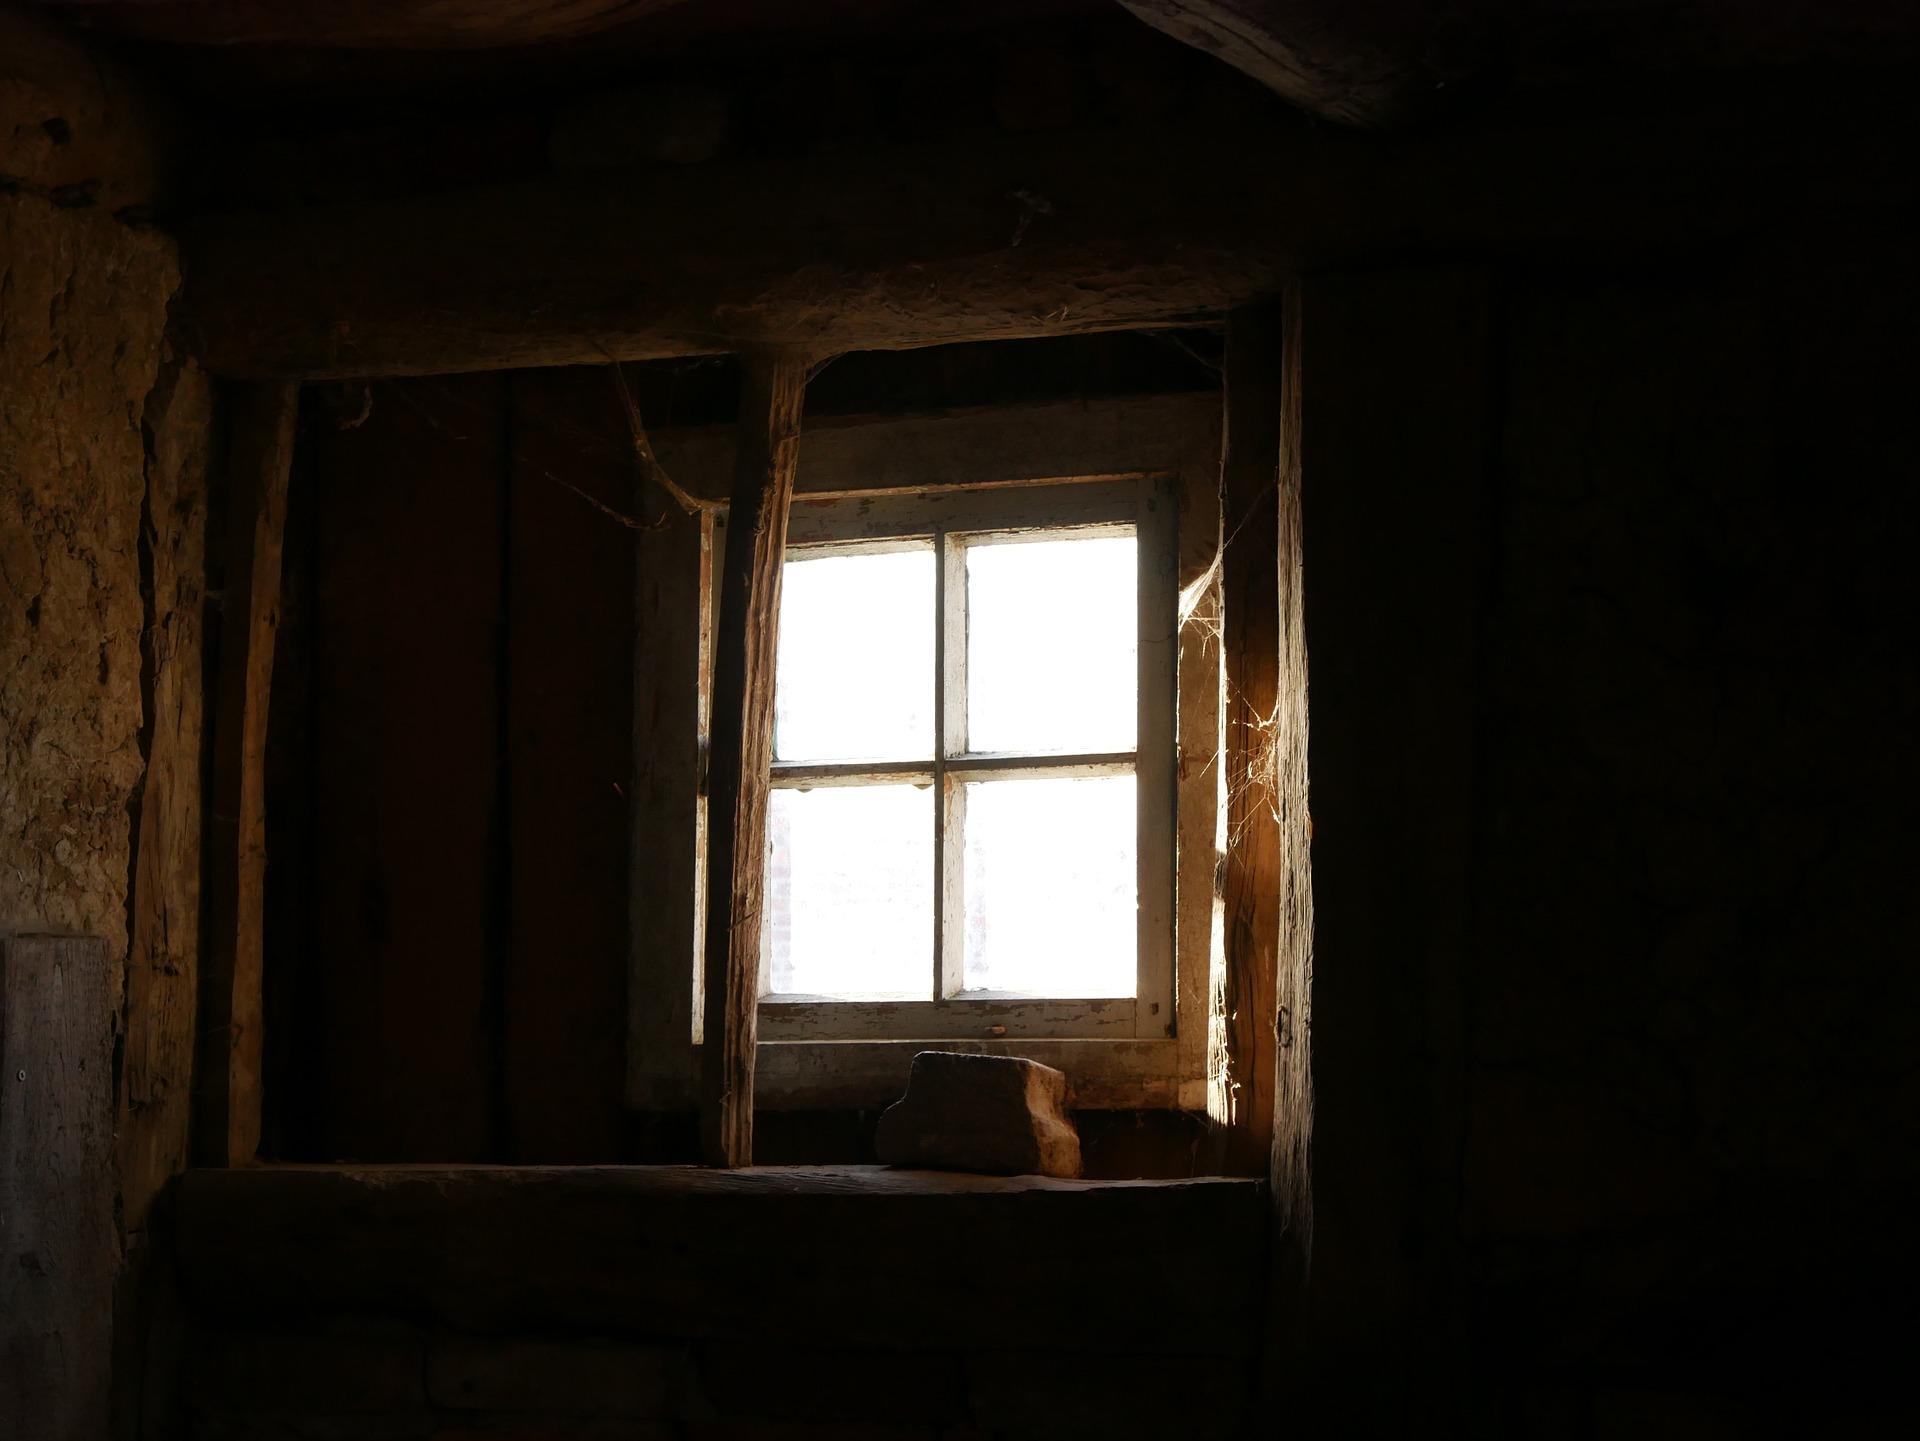 window-1190509_1920